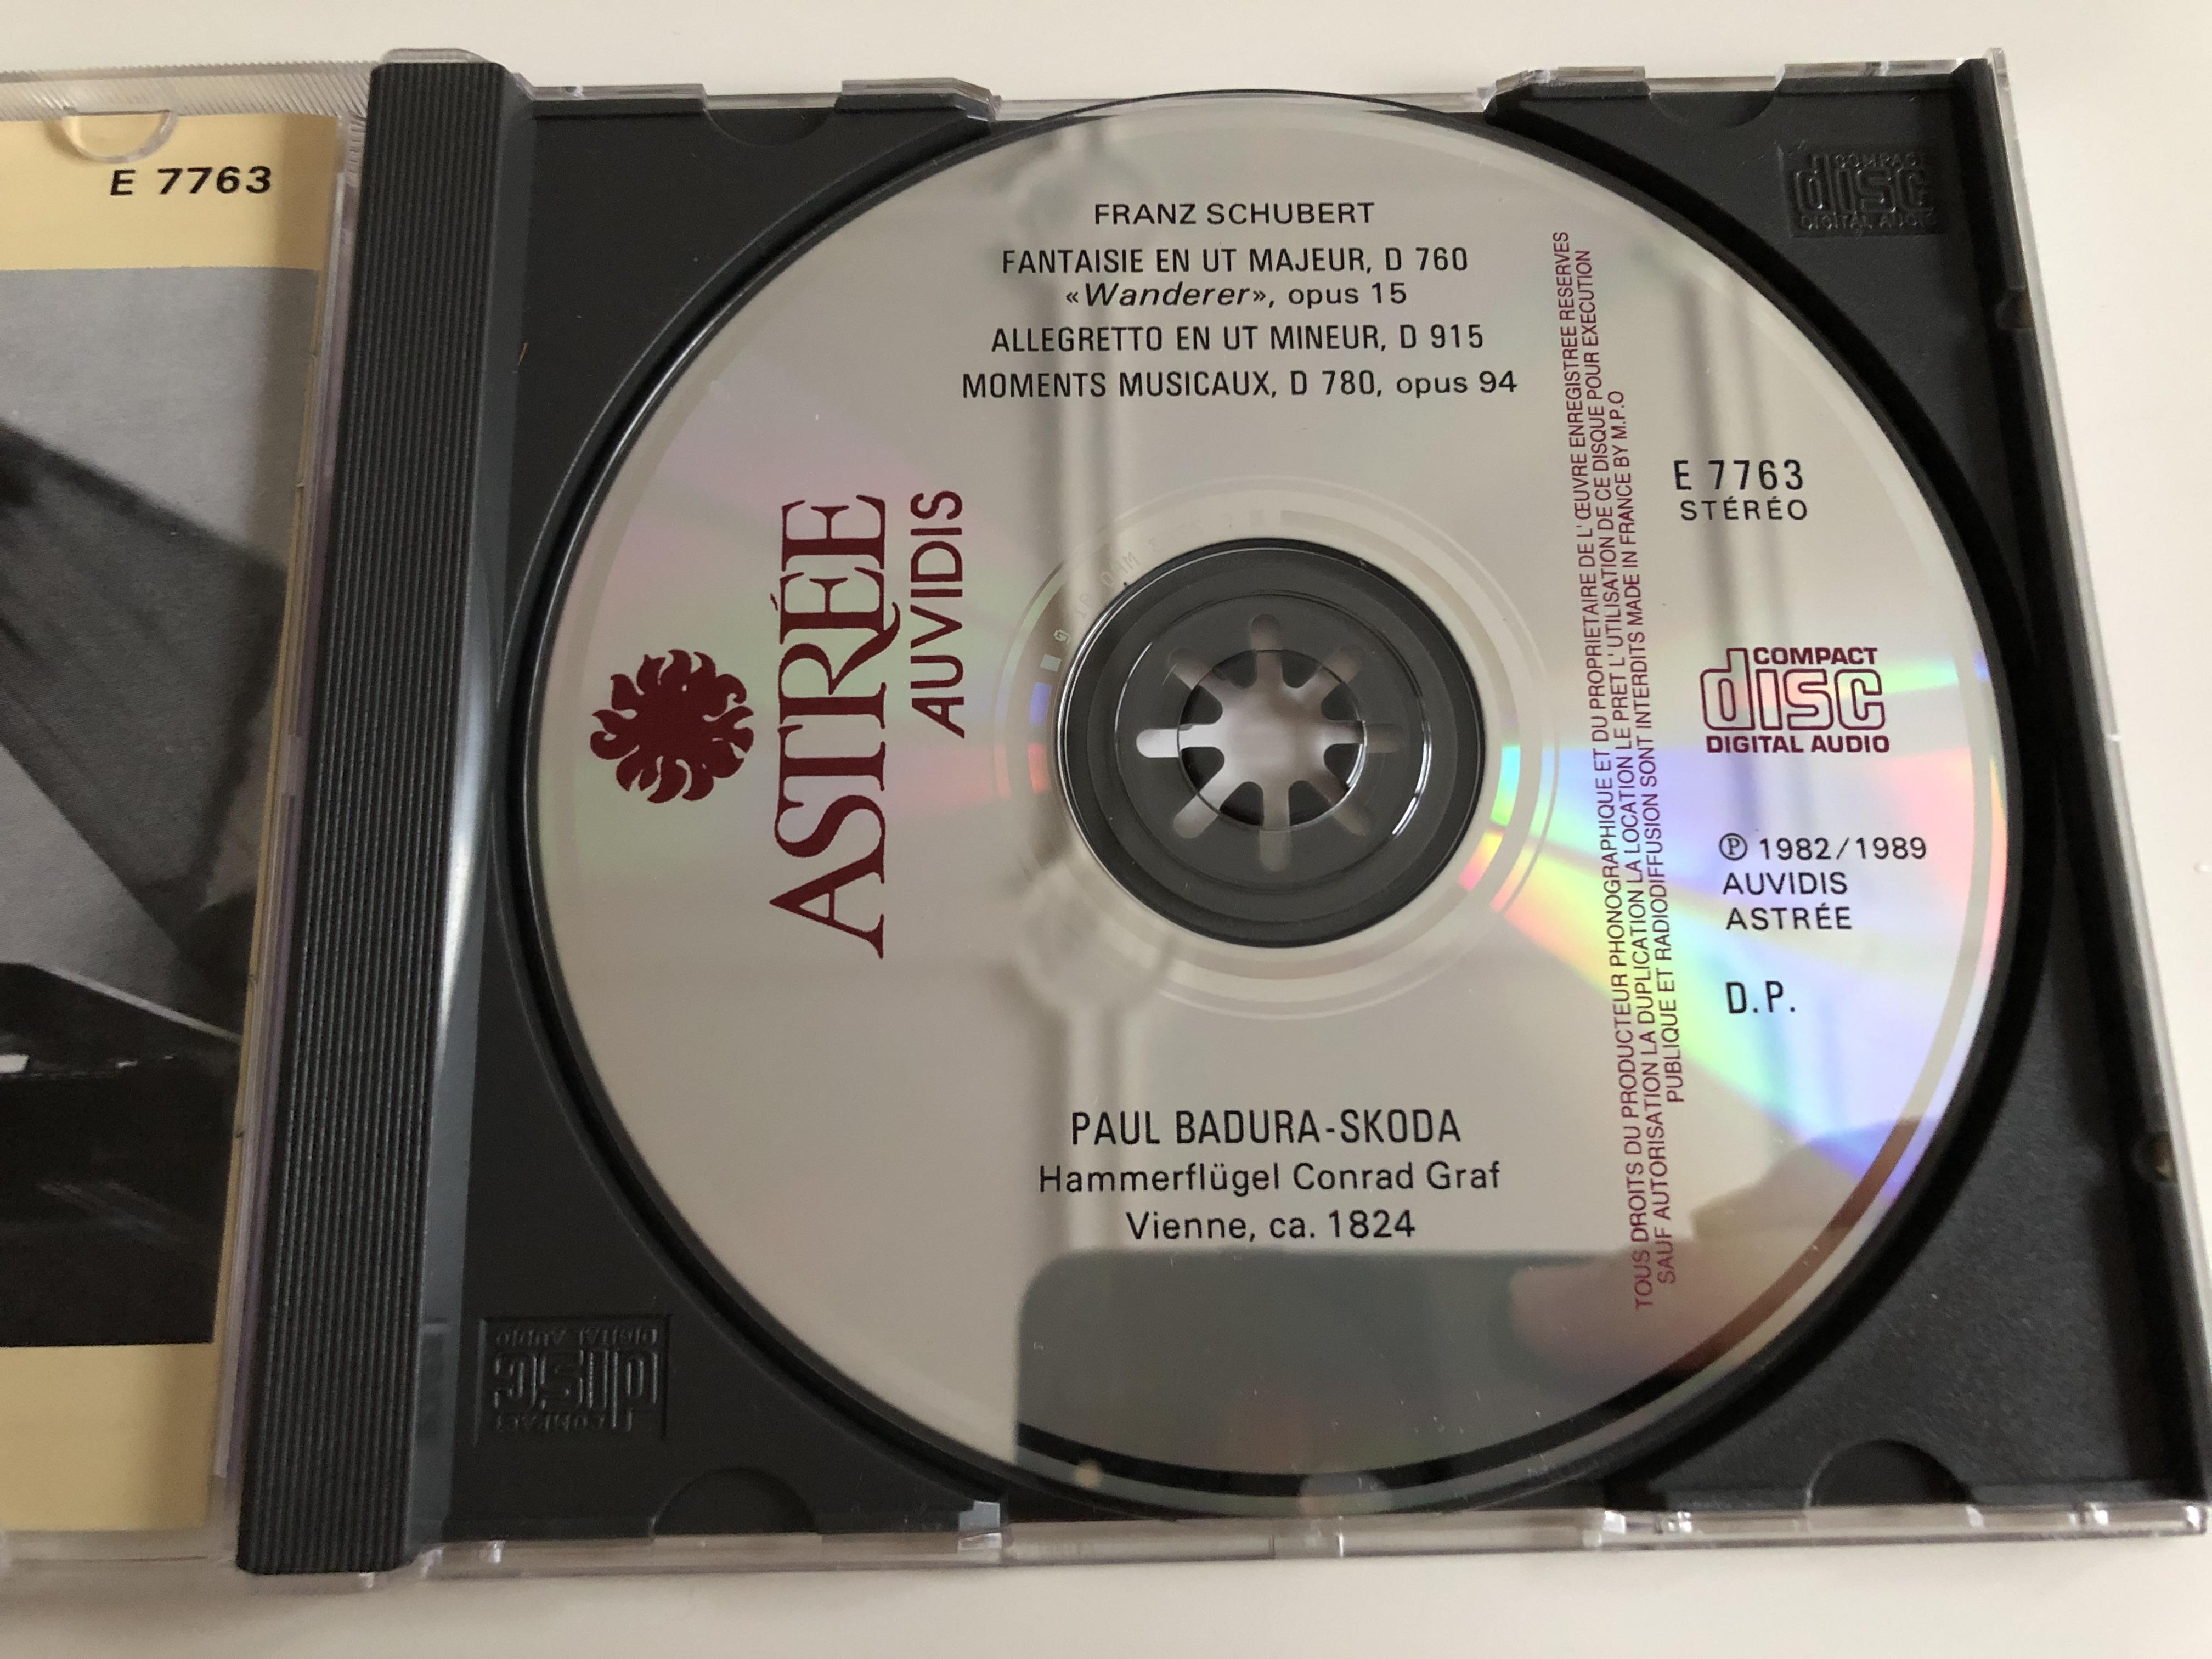 franz-schubert-fantaisie-pour-le-piano-forte-euvre-15-wanderer-fantasie-moments-musicaux-euvre-94-paul-badura-skoda-hammerfl-gel-conrad-graf-vienna-ca.-1824-audio-cd-e7763-auvidis-3-.jpg